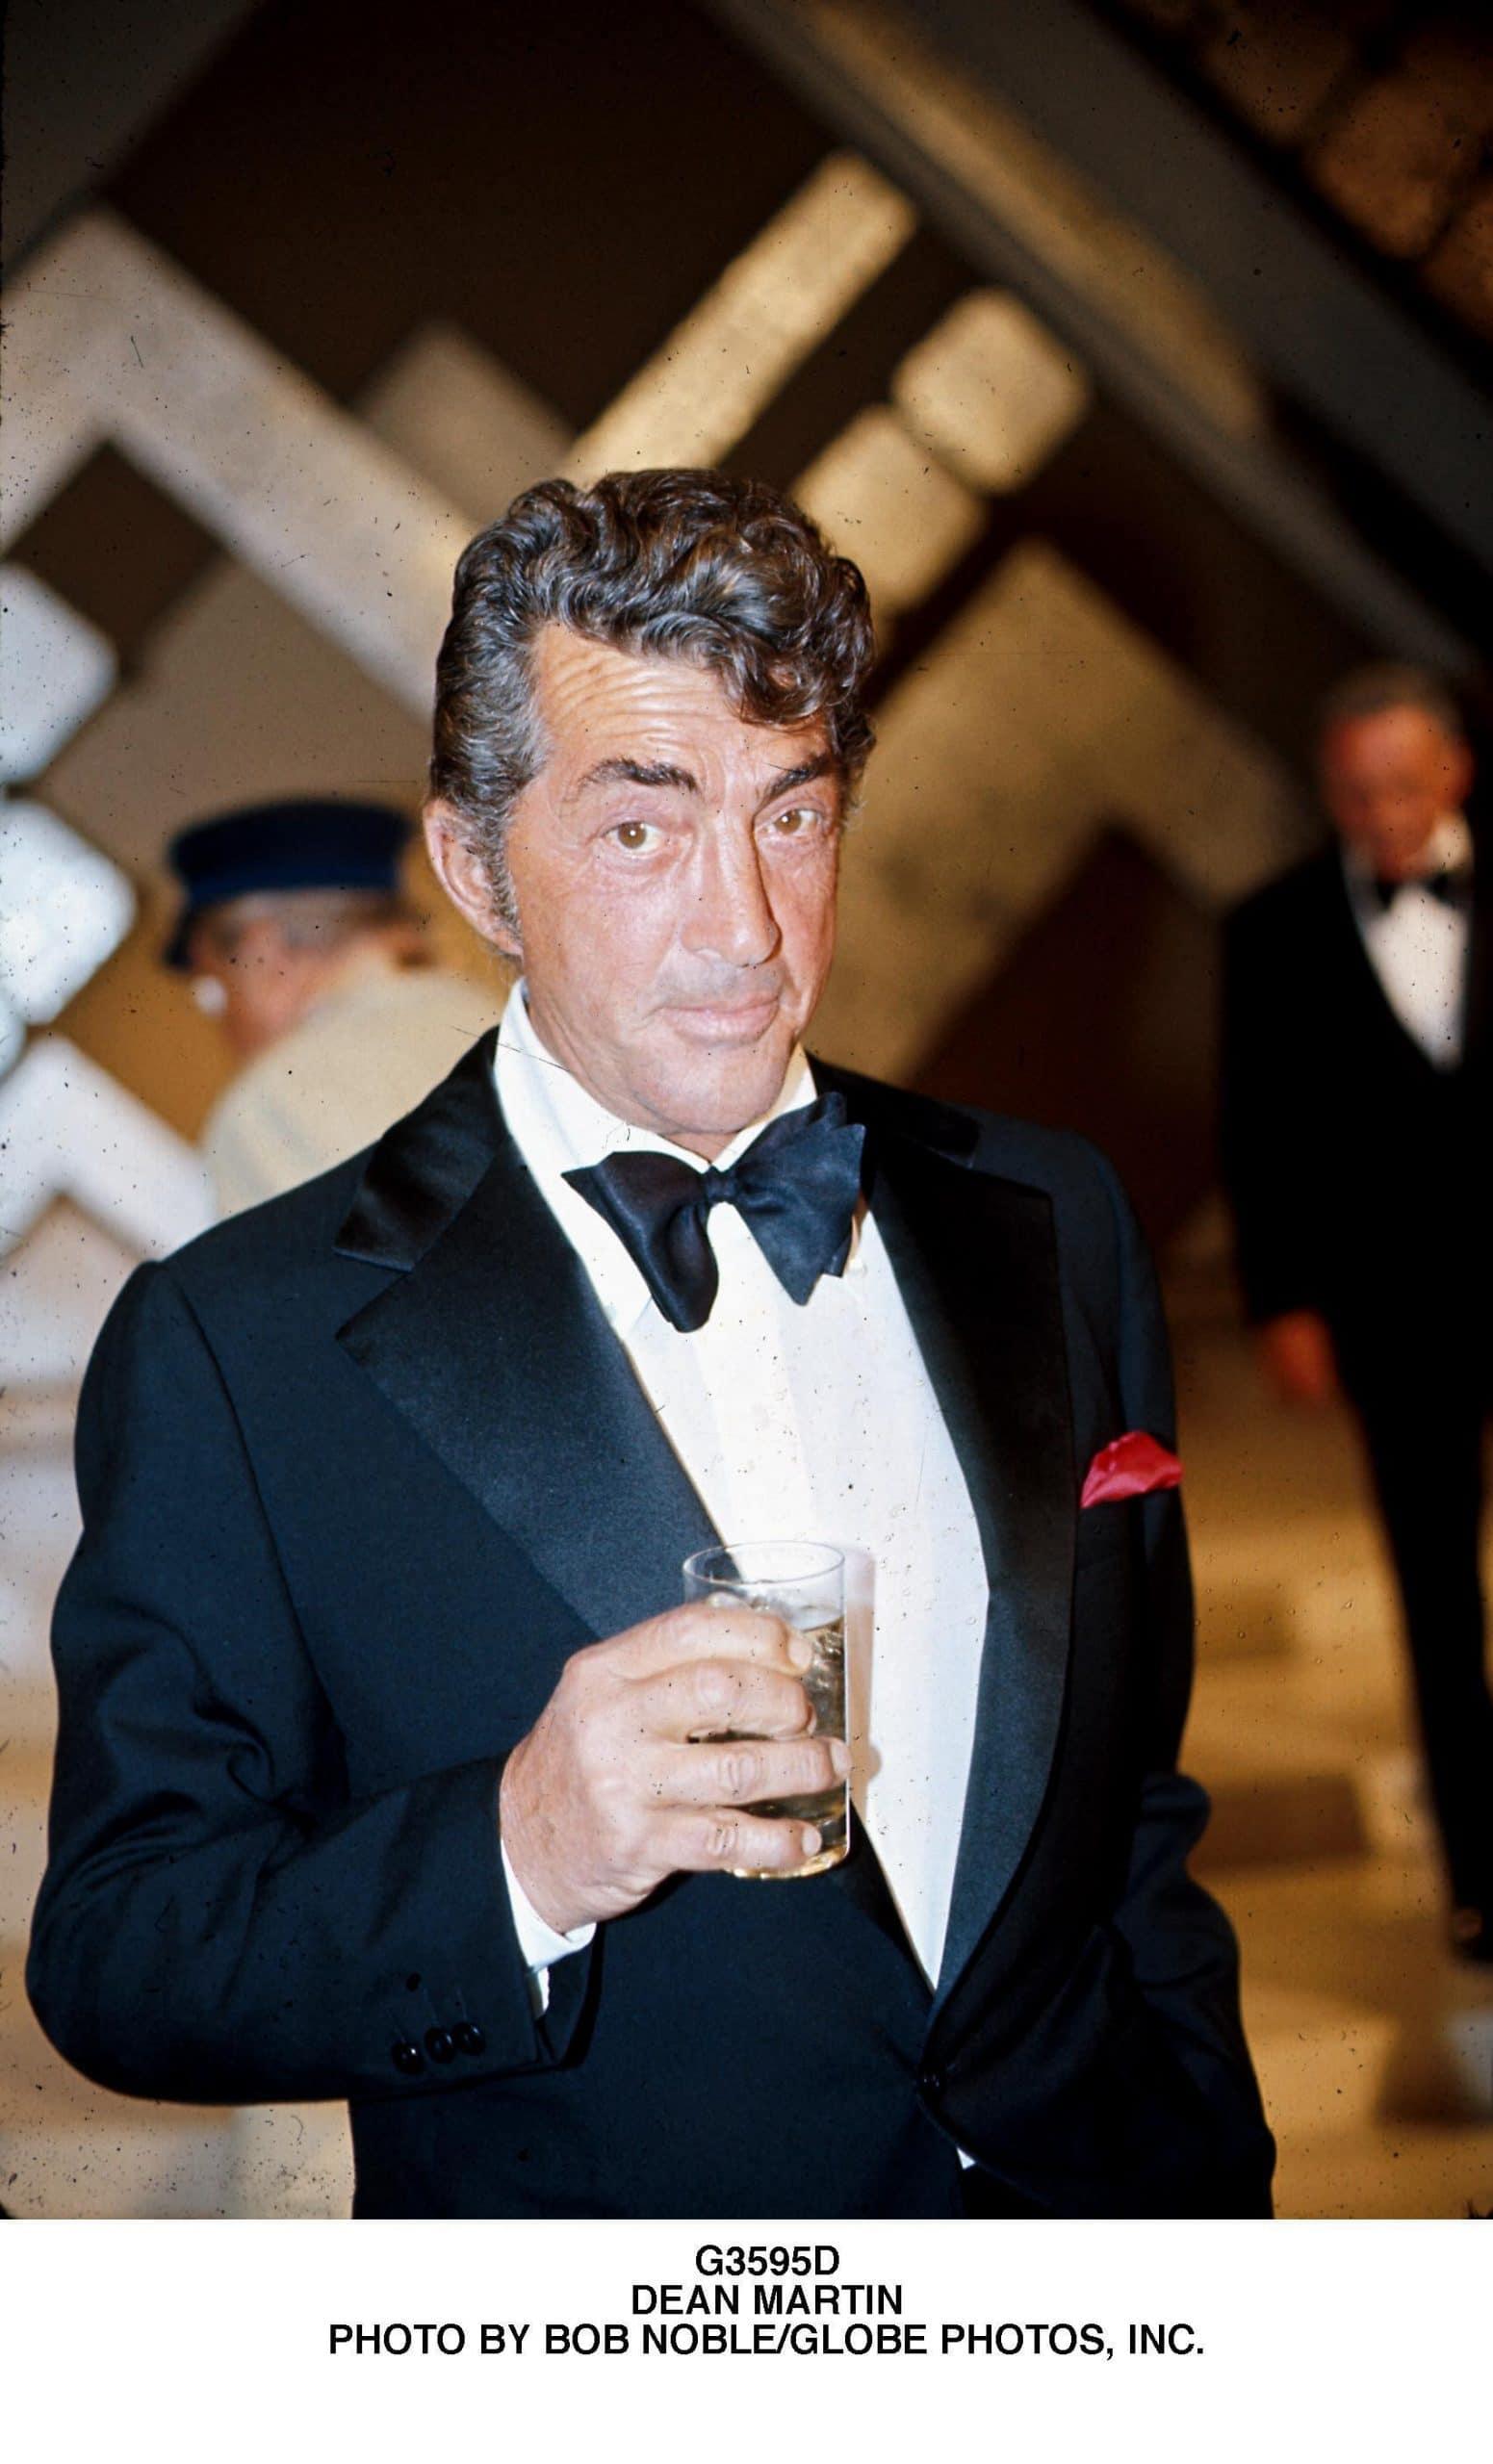 top musical legend survey says dean martin